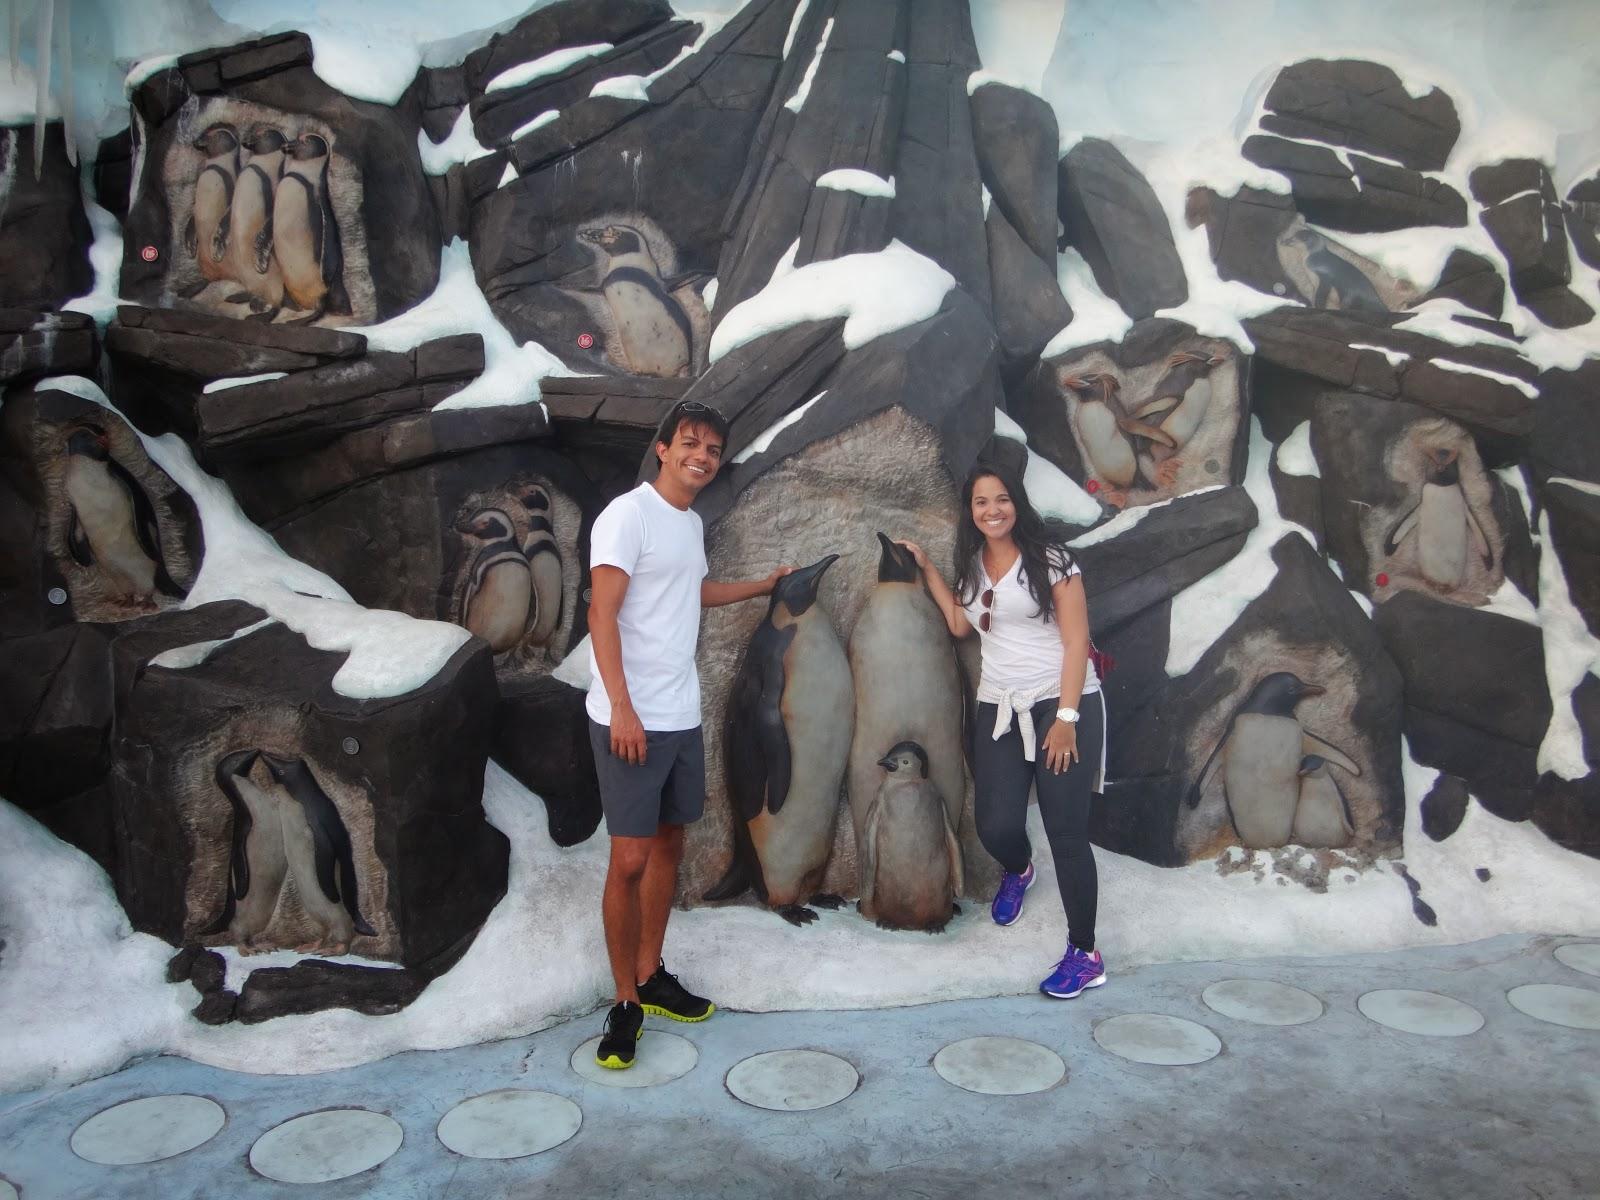 pinguins - penguin encounter - parque sea world - orlando, florida